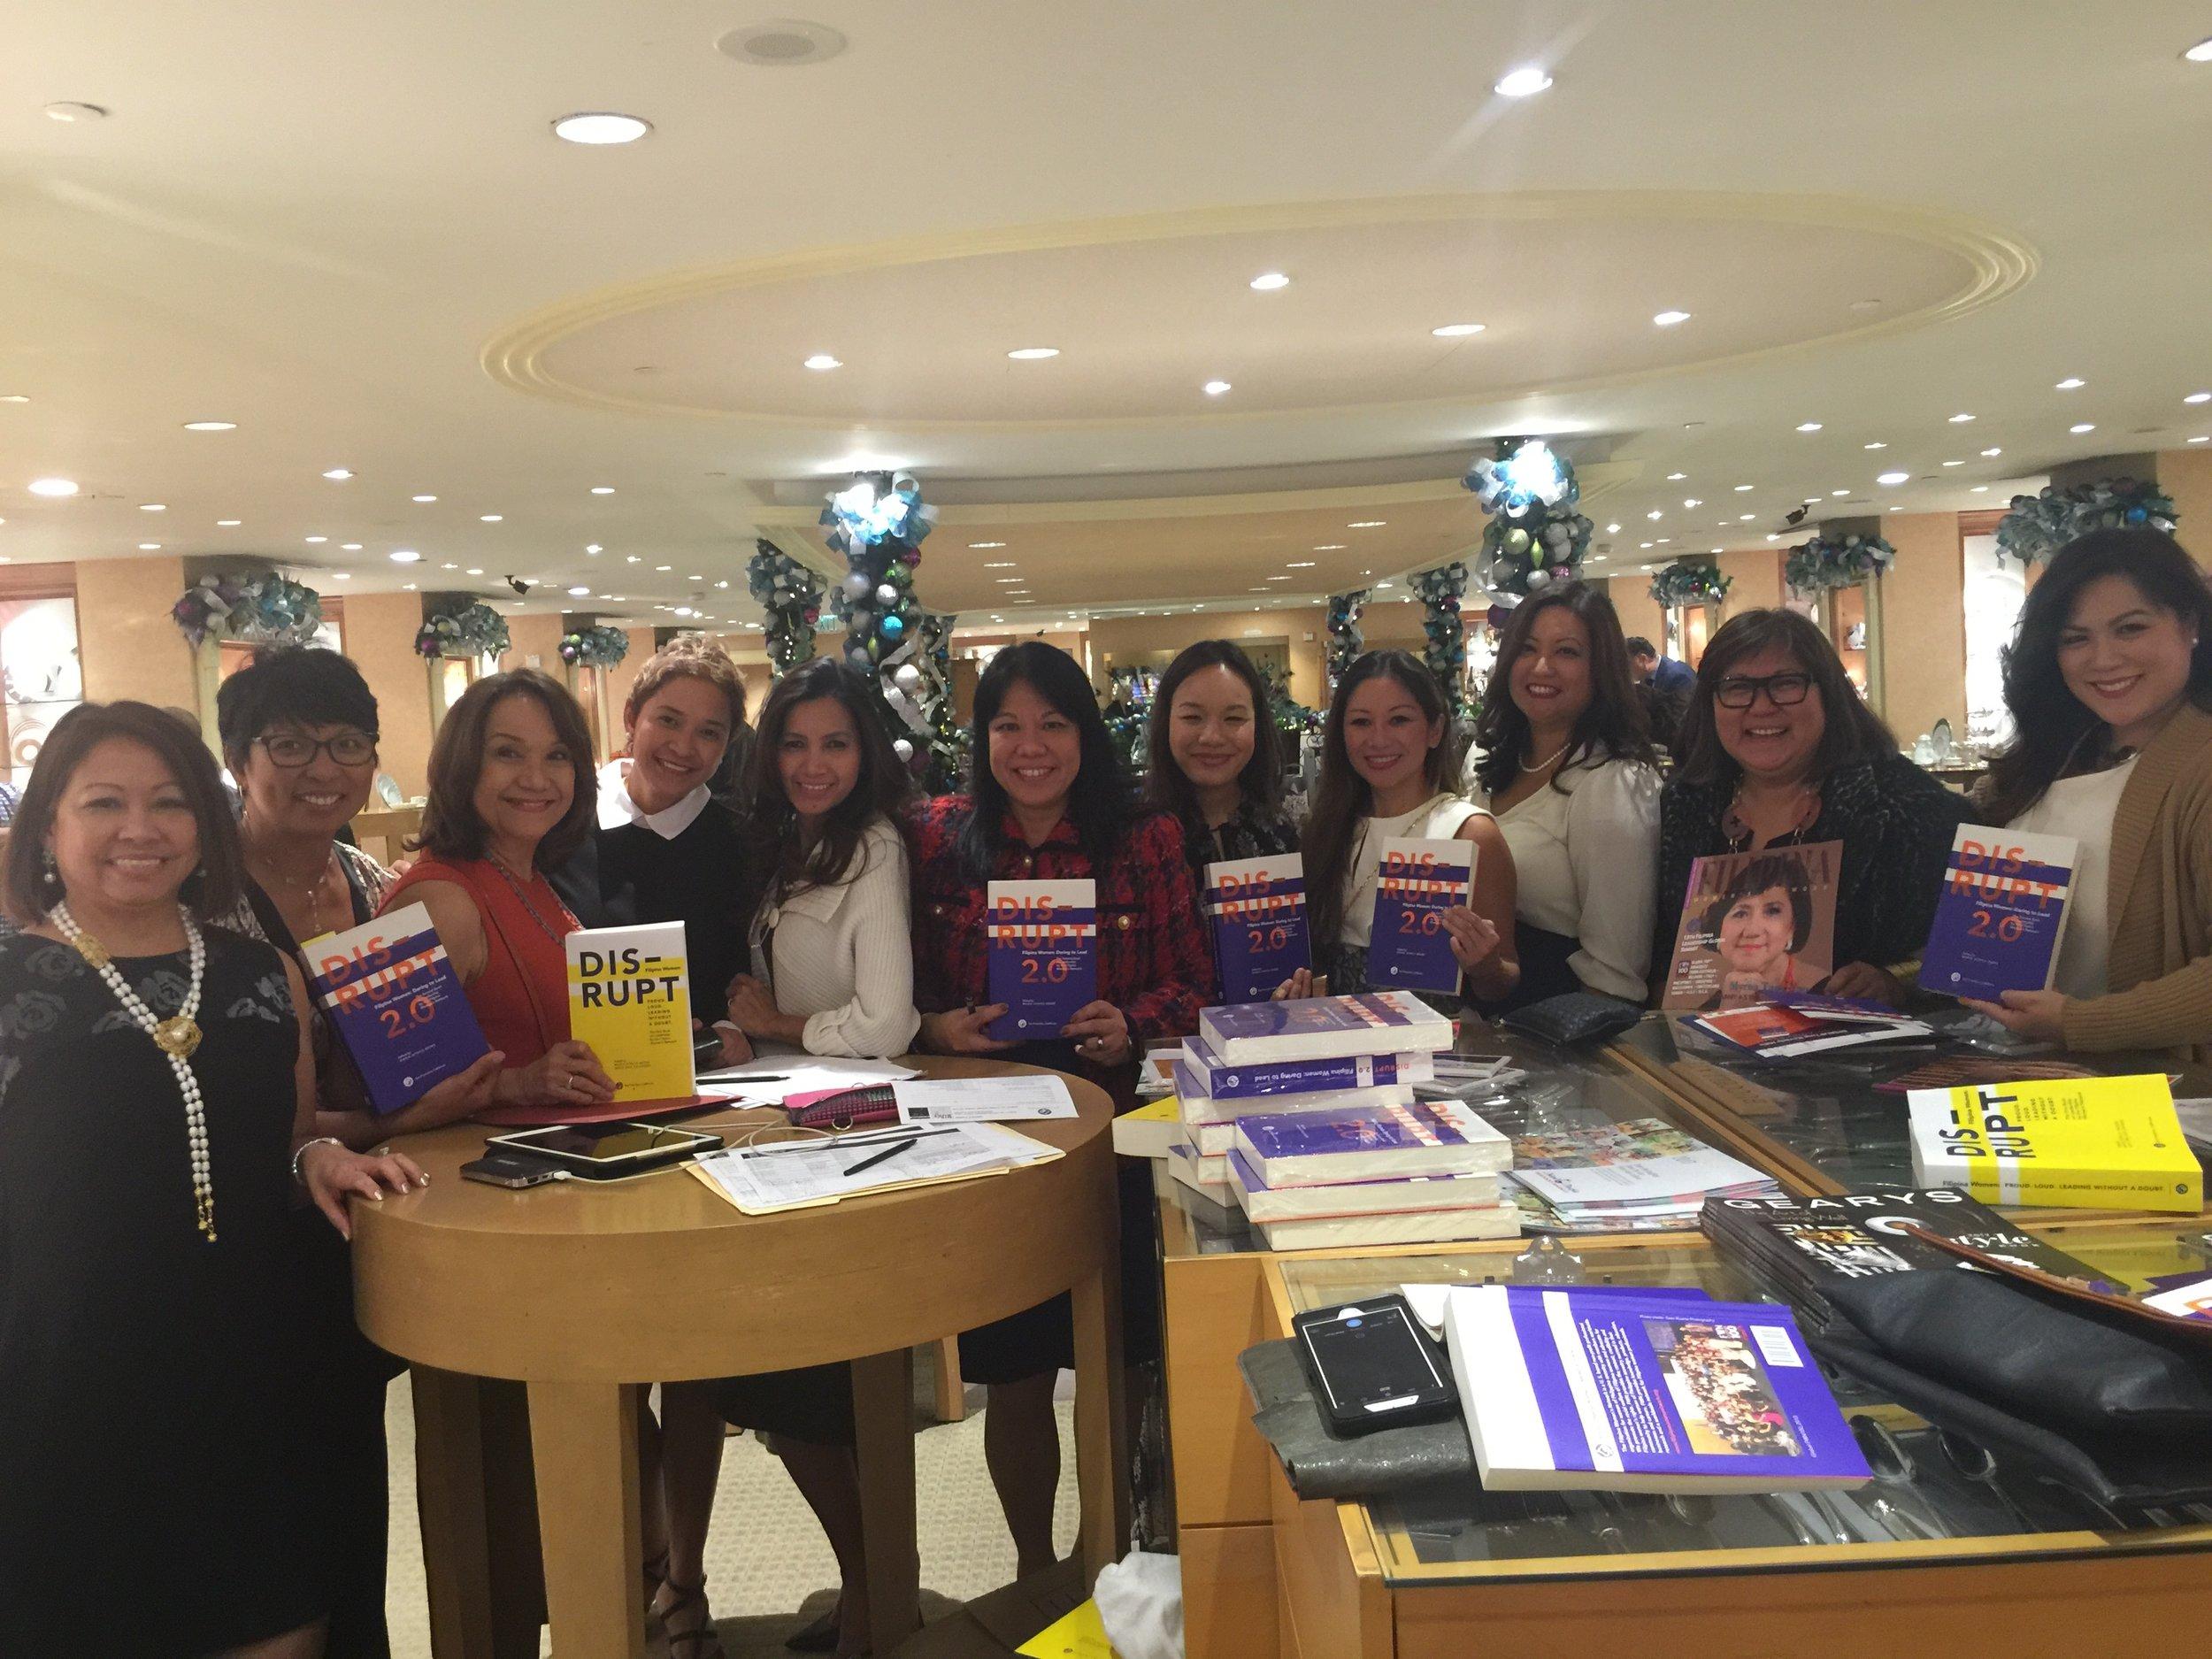 FWN Members and #FilipinaDISRUPTERS take over Geary's Beverly Hills. Pictured (L-R):Sonia Delen (U.S. FWN100™ '07), Vina Lustado (Global FWN100™ '15),Rocio Nuyda (U.S. FWN100™ '12, Global FWN100™ '16), Charina Vergara (Global FWN100™ '16), Rosario Cajucom-Bradbury (Global FWN100™ '16), Benel Se-Liban (U.S. FWN100™ '11), Melissa Orquiza (Global FWN100™ '15), Jacqueline D. Yu (U.S. FWN100™ '12), Melissa Ramoso (Global FWN100™ '14), Marily Mondejar (Founder & CEO, Filipina Women's Network), Francine Maigue (Global FWN100™ '15).